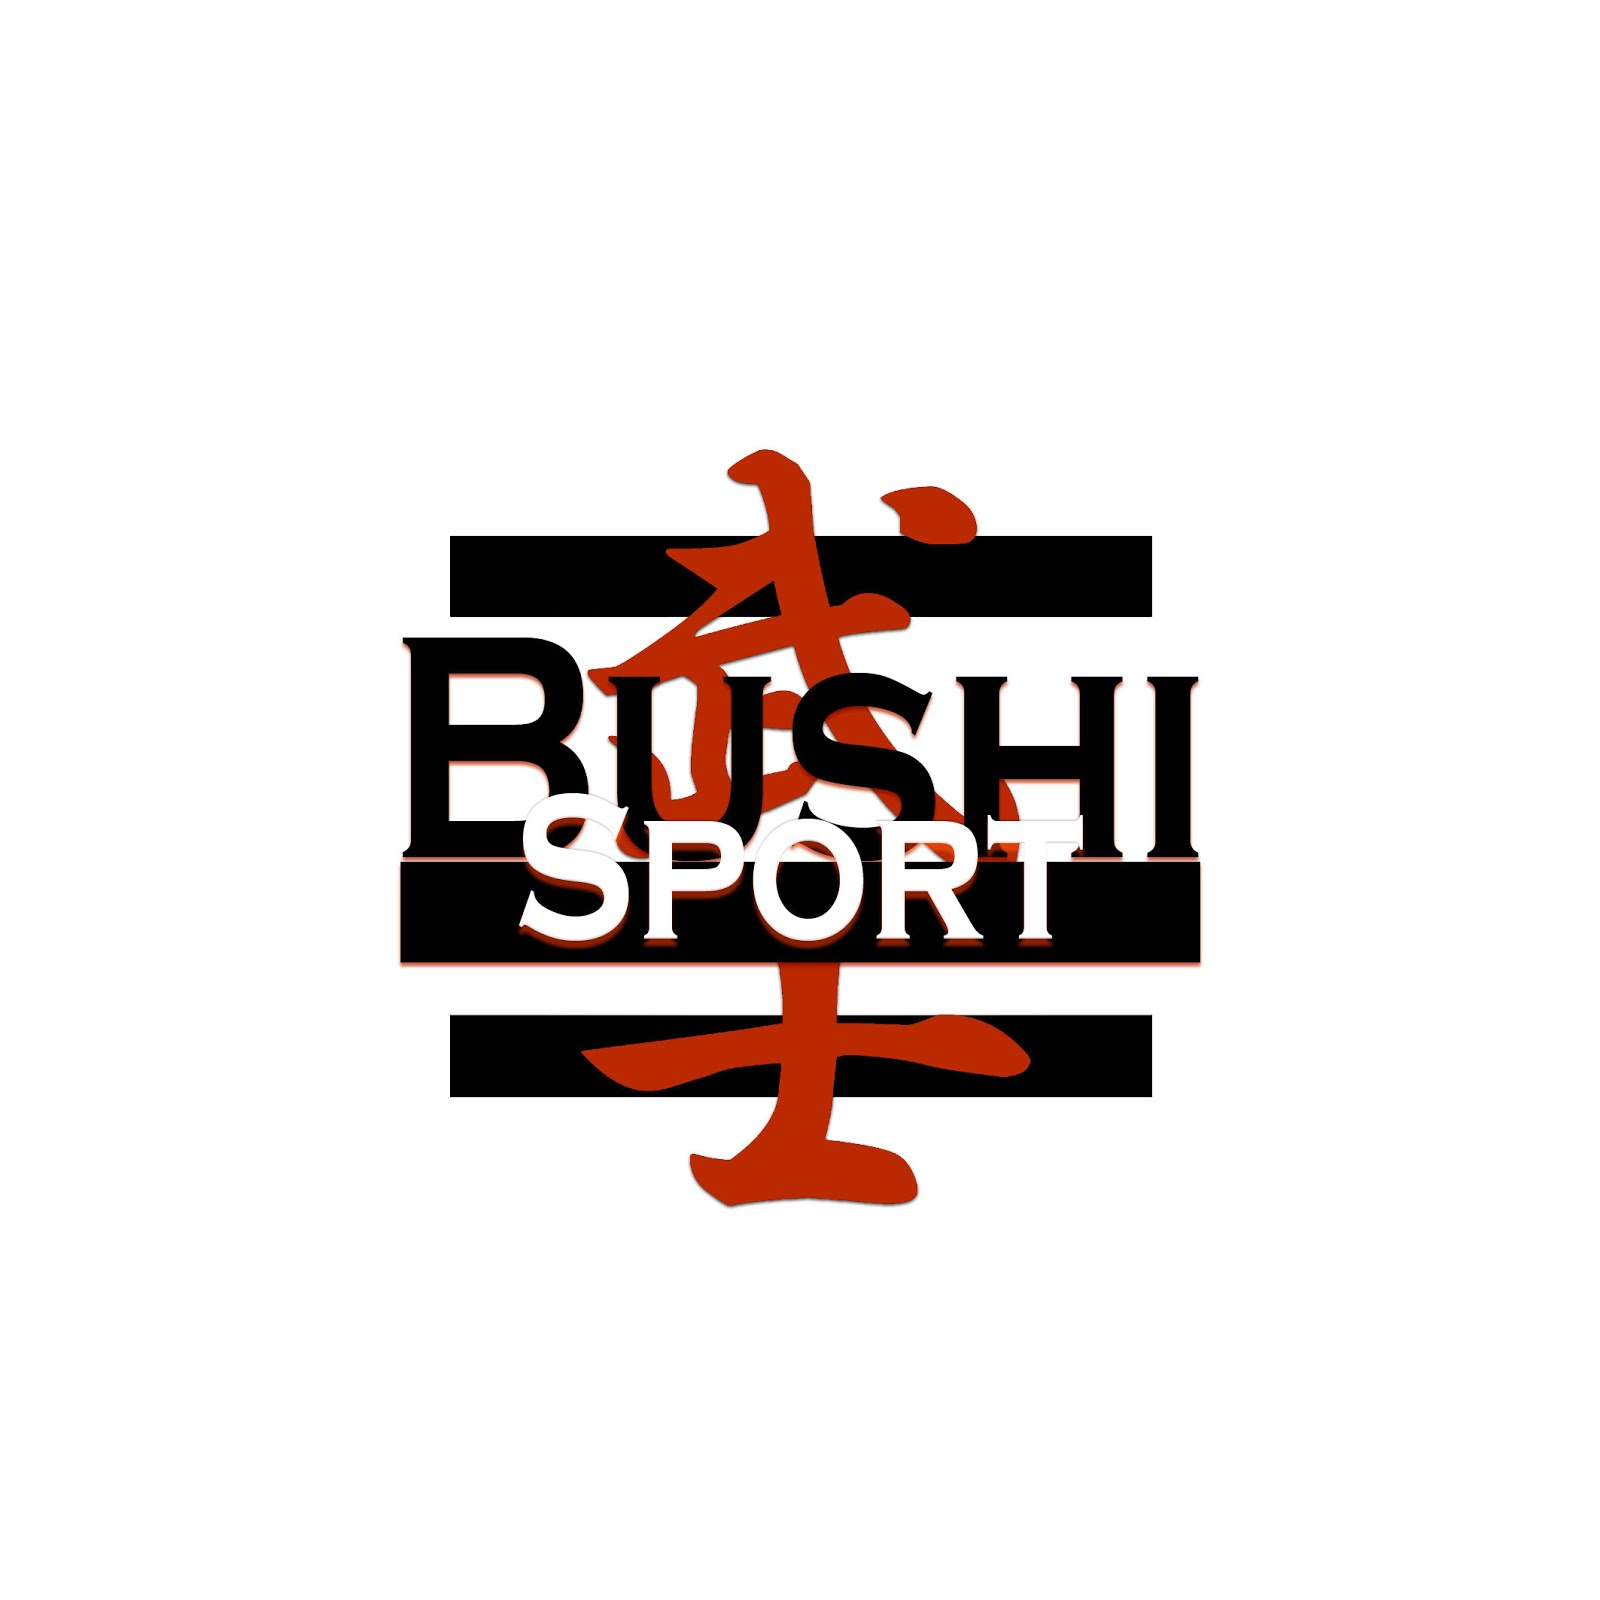 Bushi sport